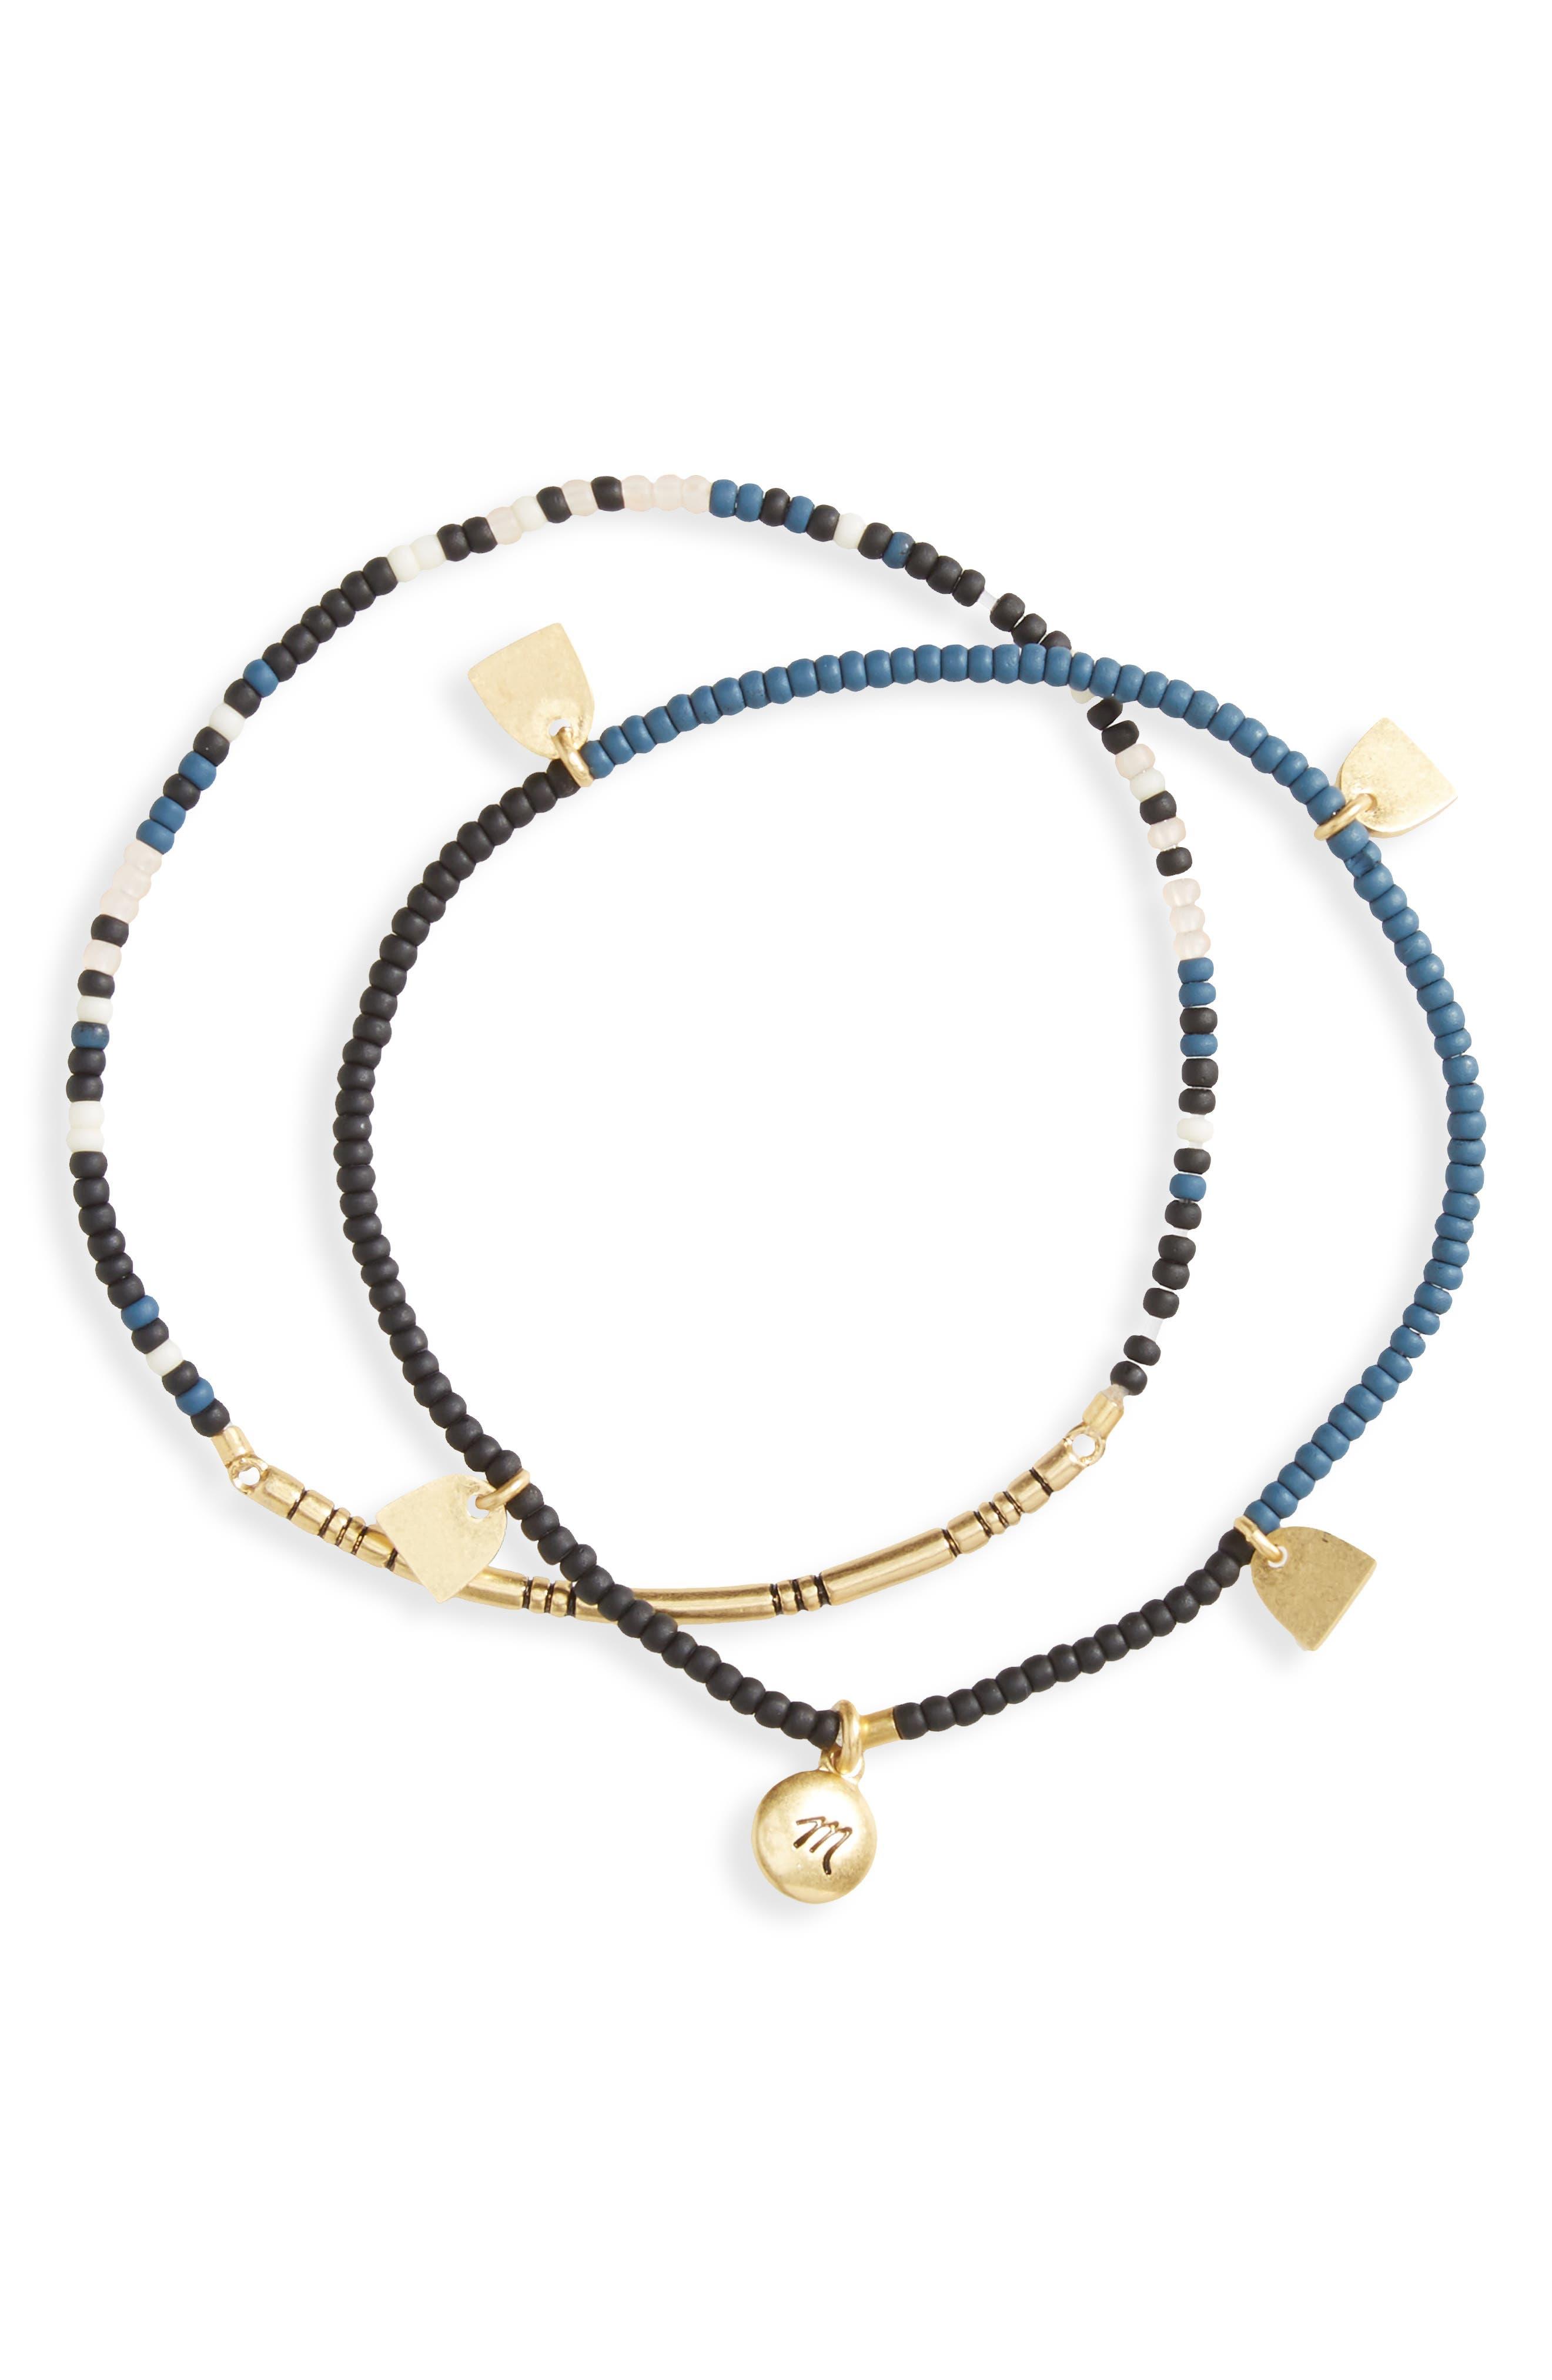 Main Image - Madewell Set of 2 Tassel Stretch Bracelets